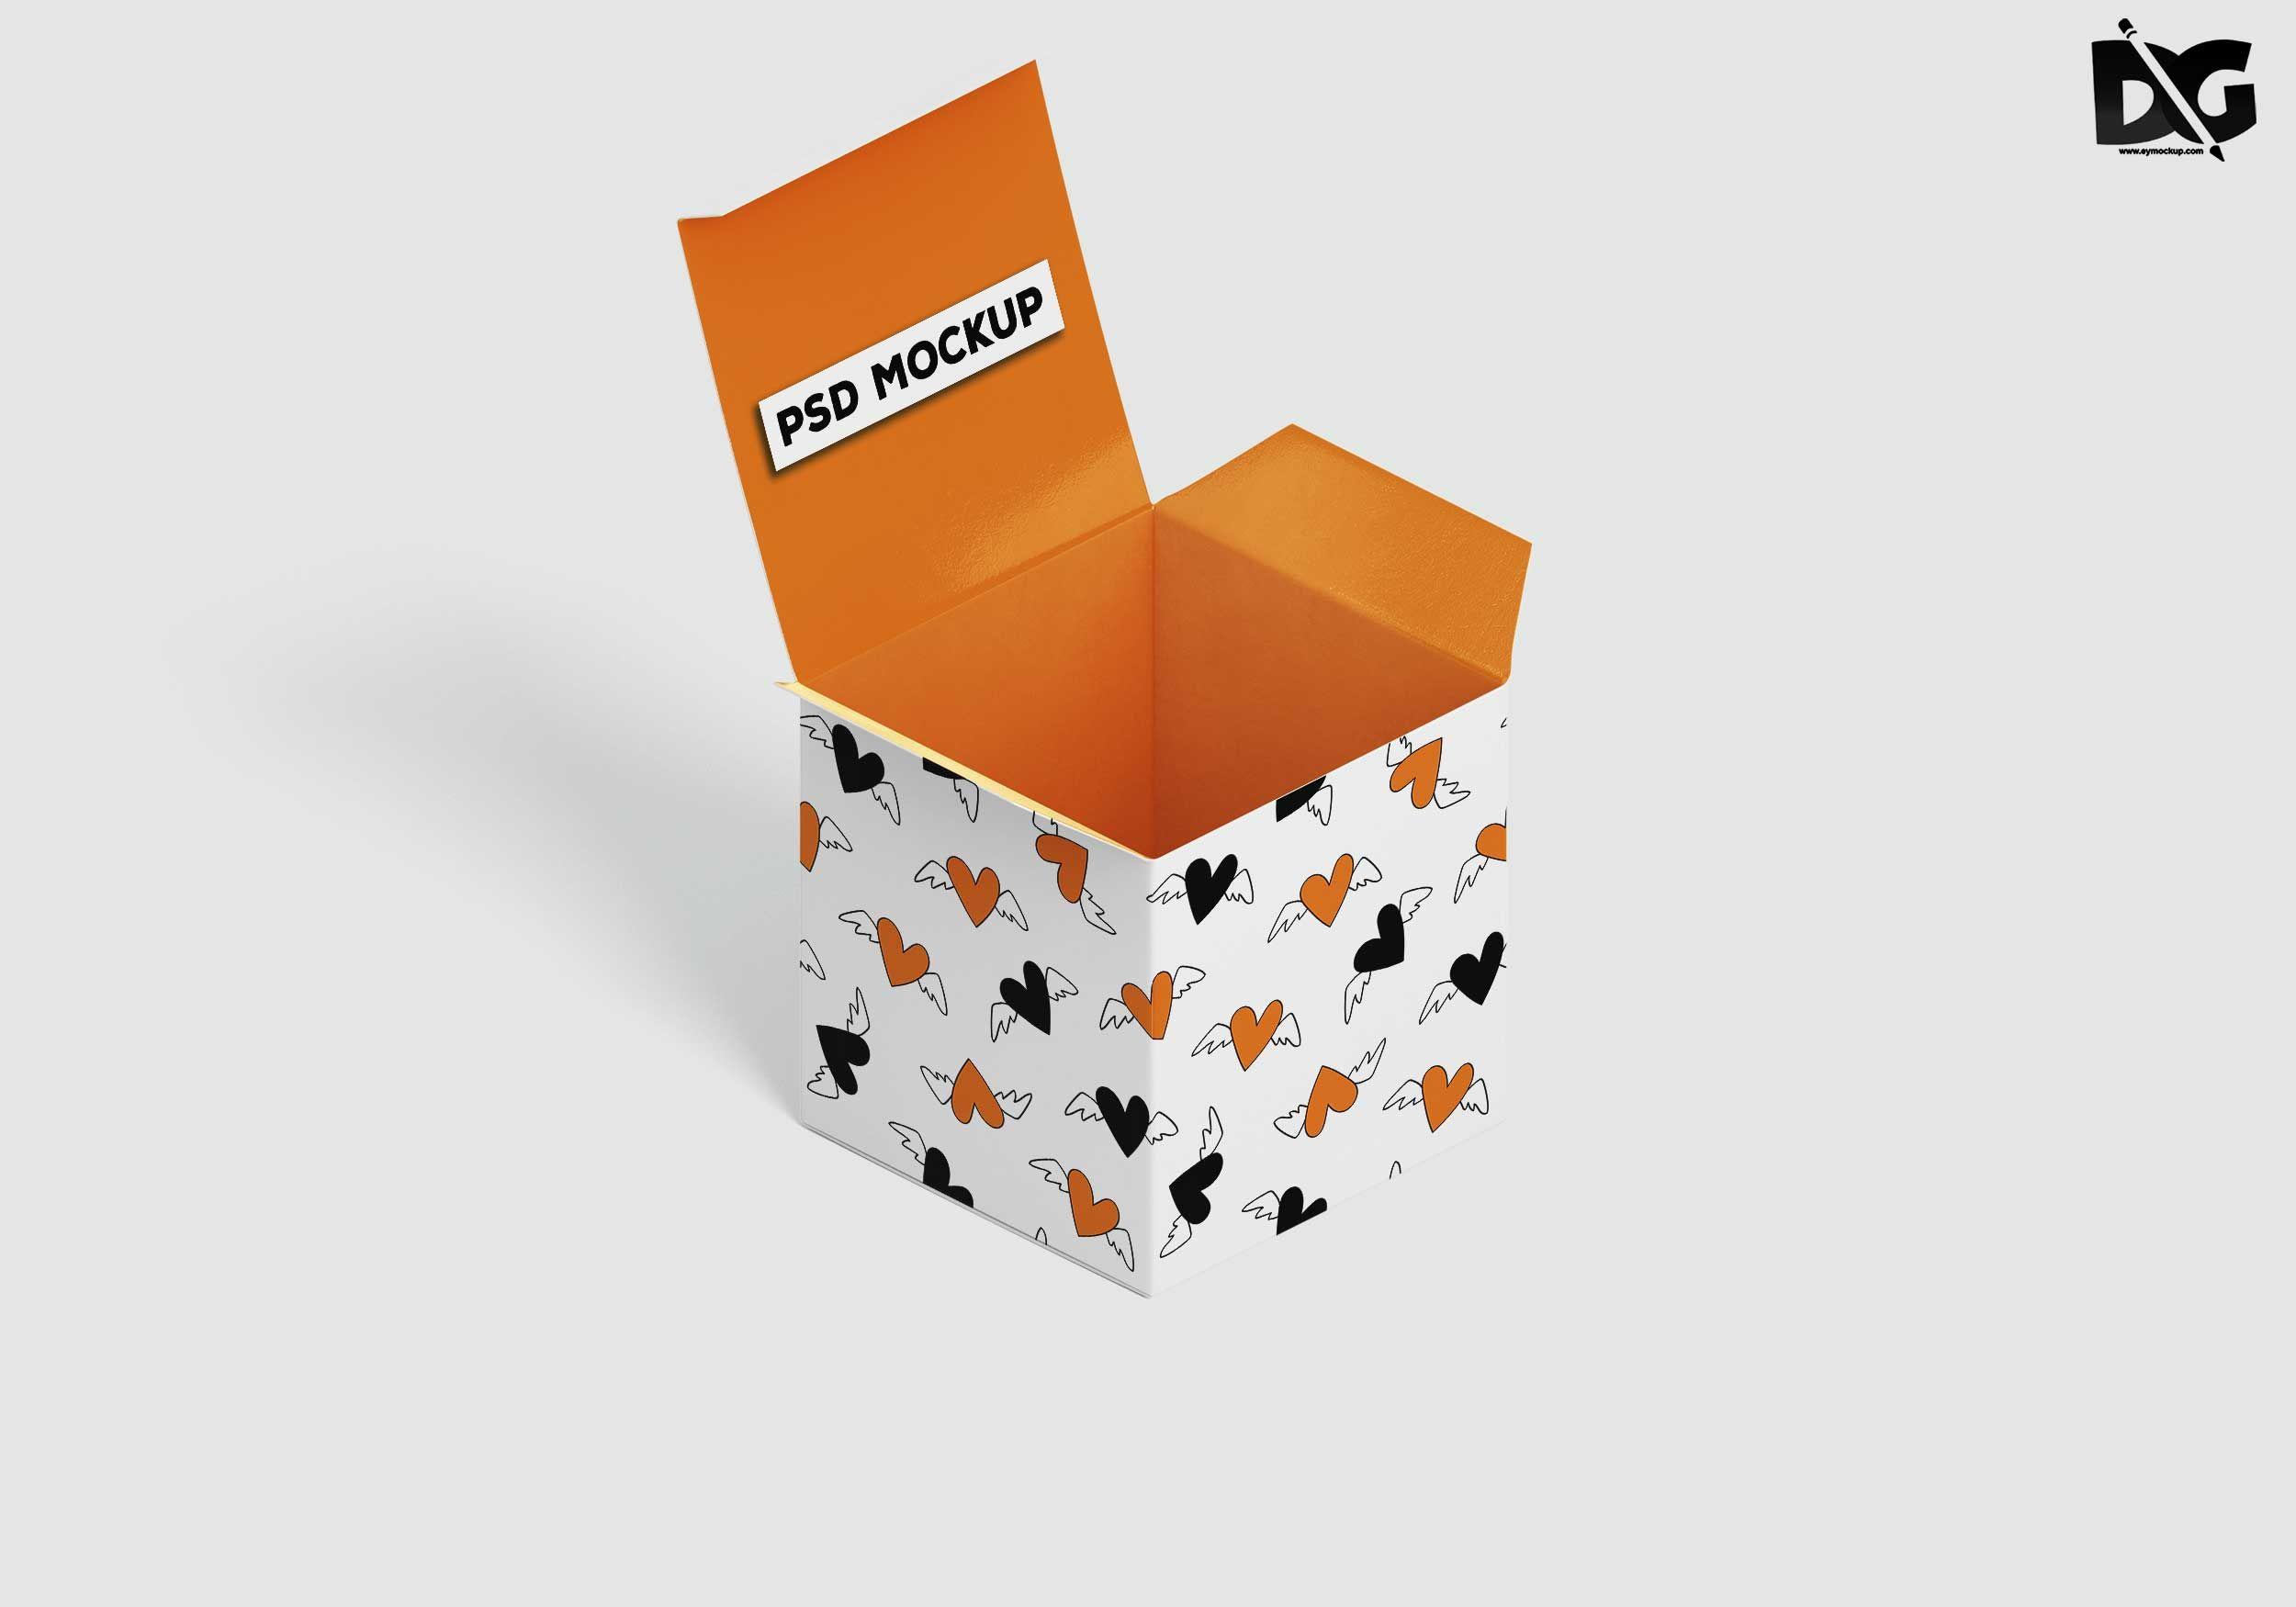 Download Free Psd Open Shoe Box Artwork Mockup Artworkmockup Boxmockup Branding Download Downloadpsd Free Freemockup Mockup Psd Mockup Free Psd Free Logo Mockup